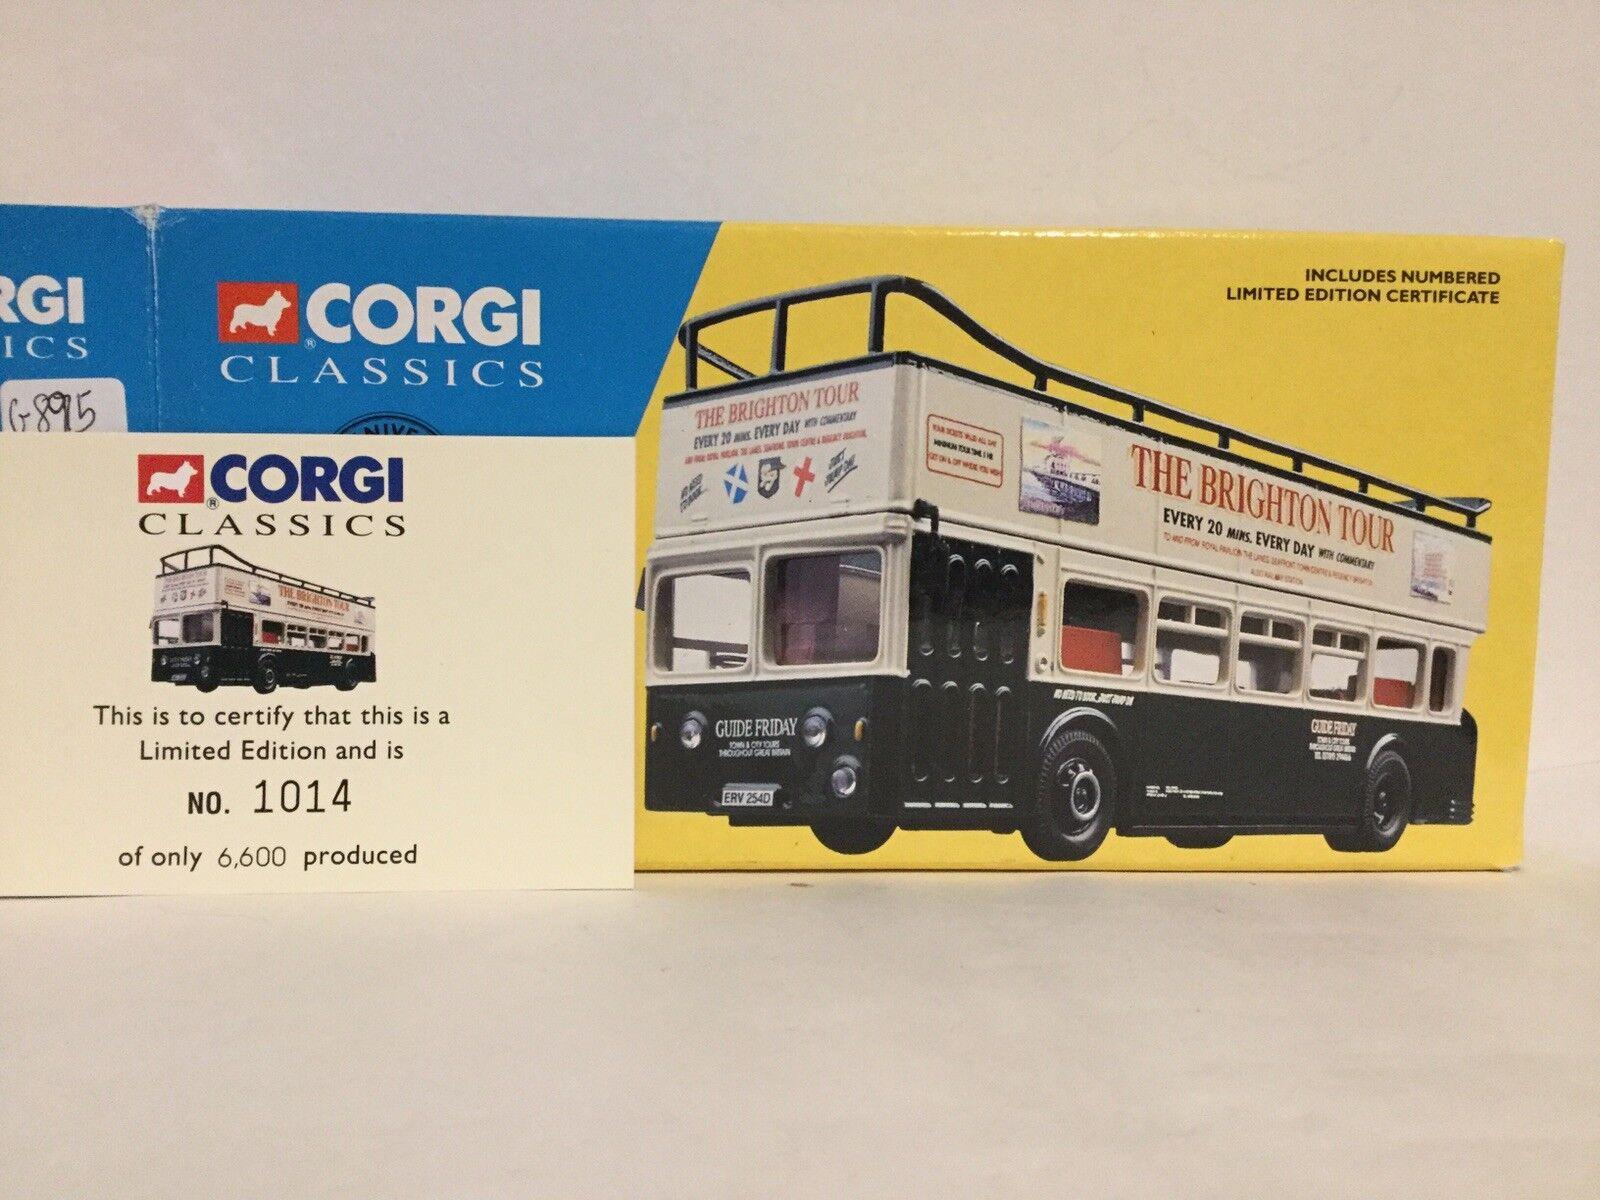 Corgi 33501 Guide Friday Leyland Atiantean open top bus LTD Edit No 1014 of 6600